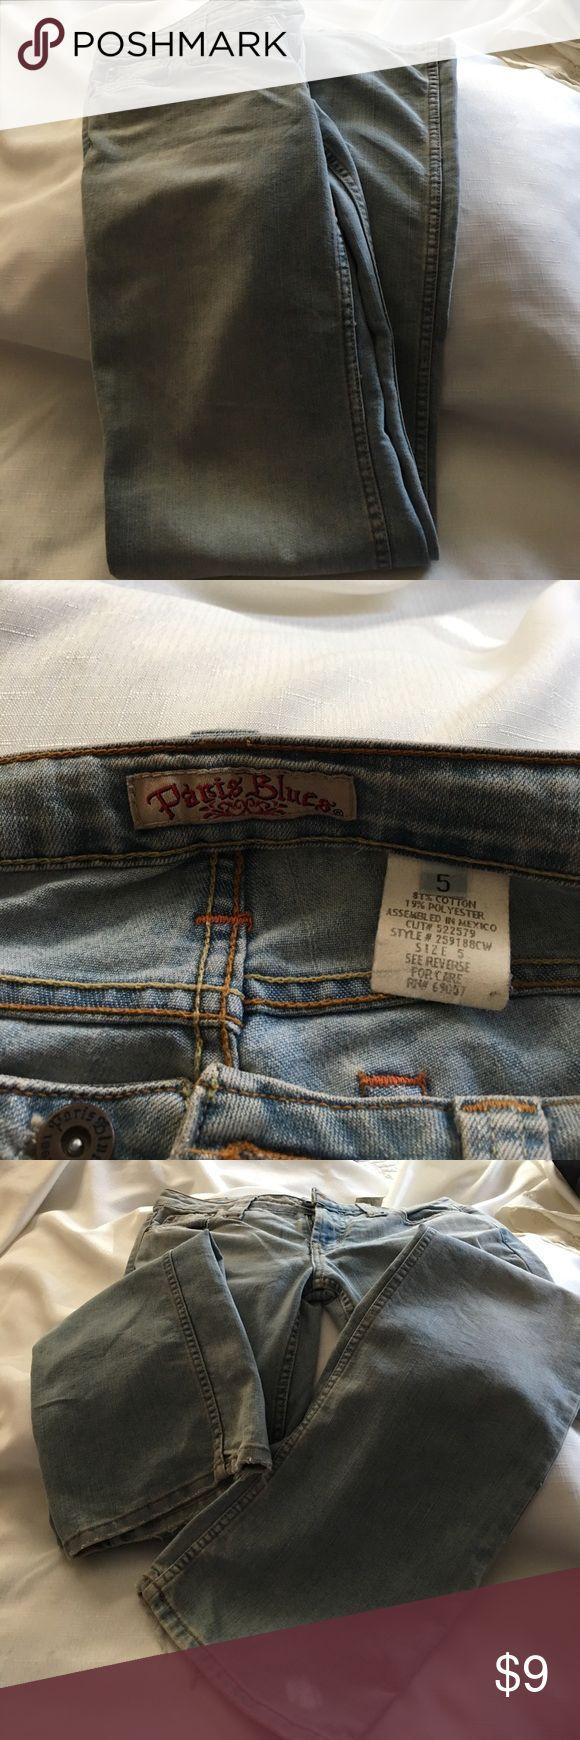 "Paris Blue Brand logo light blue jeans 💕💕💕Light blue washed look blue jeans. Very soft. Worn at the hem. Vintage look. Size 5. Inseam measures 30"" slight flare. 2 front & 2 back pockets.😊💕 Paris Blues Jeans Flare & Wide Leg"